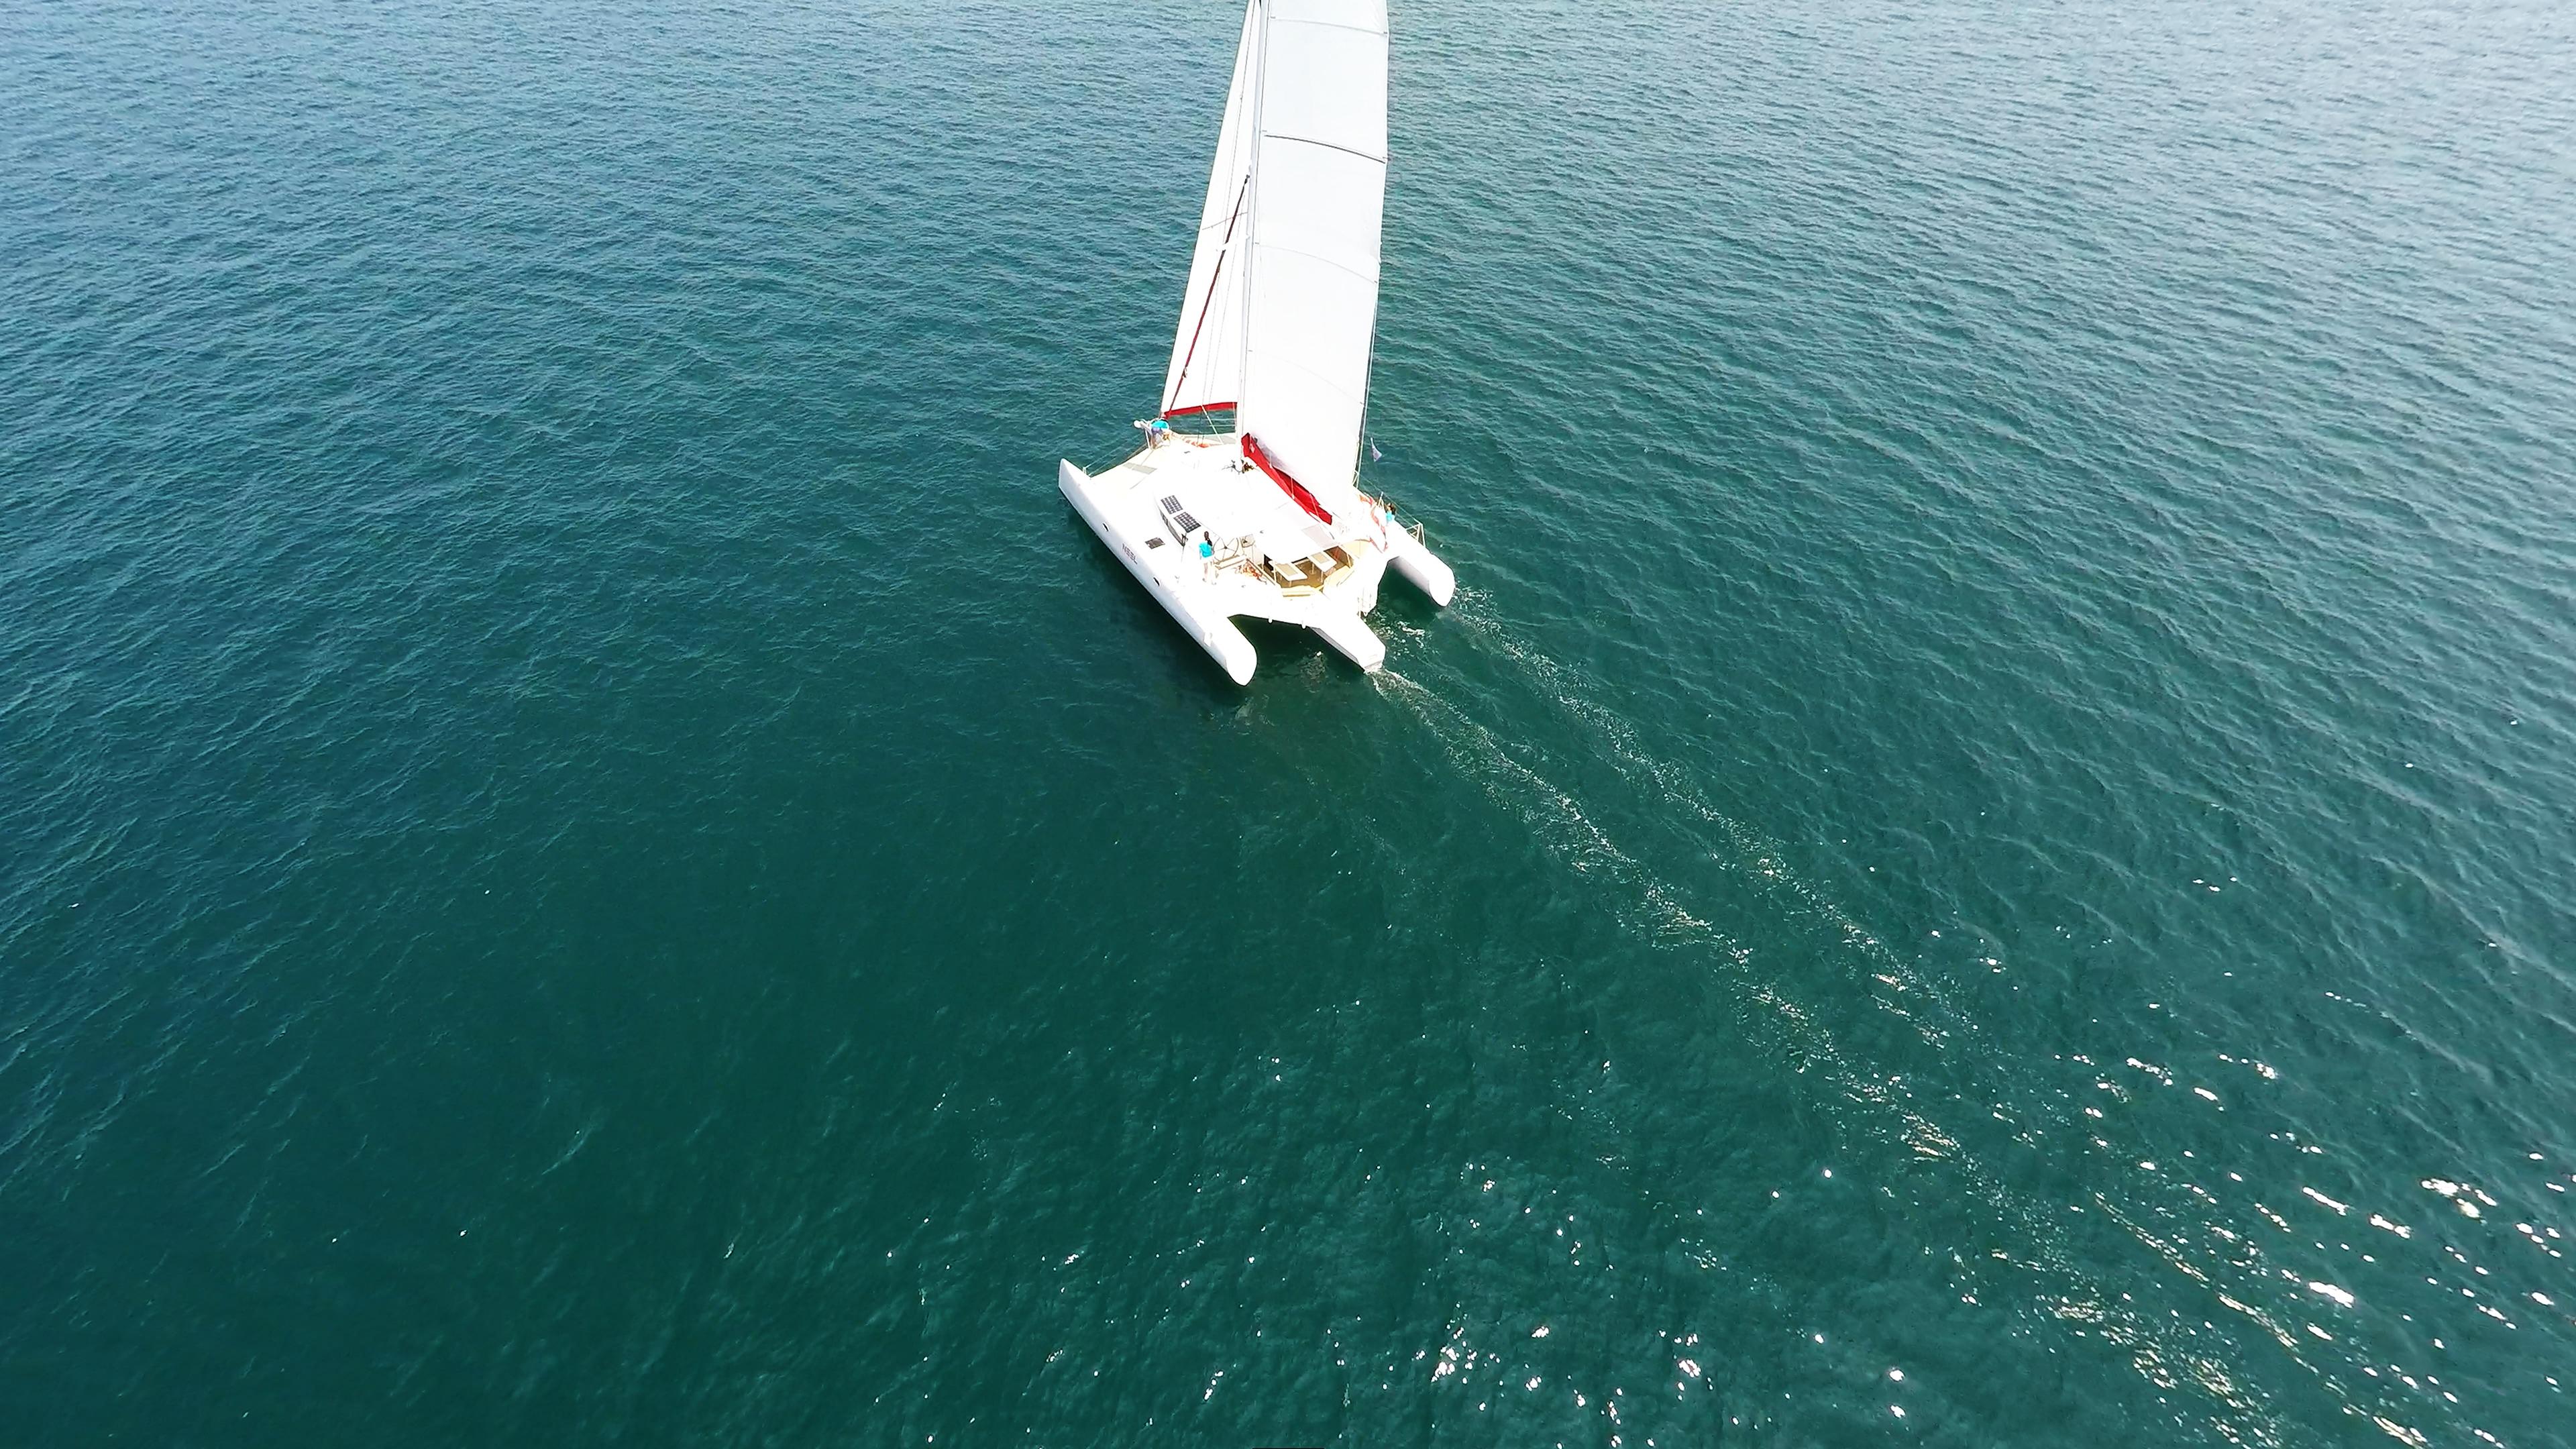 trimarano foto aerea vela